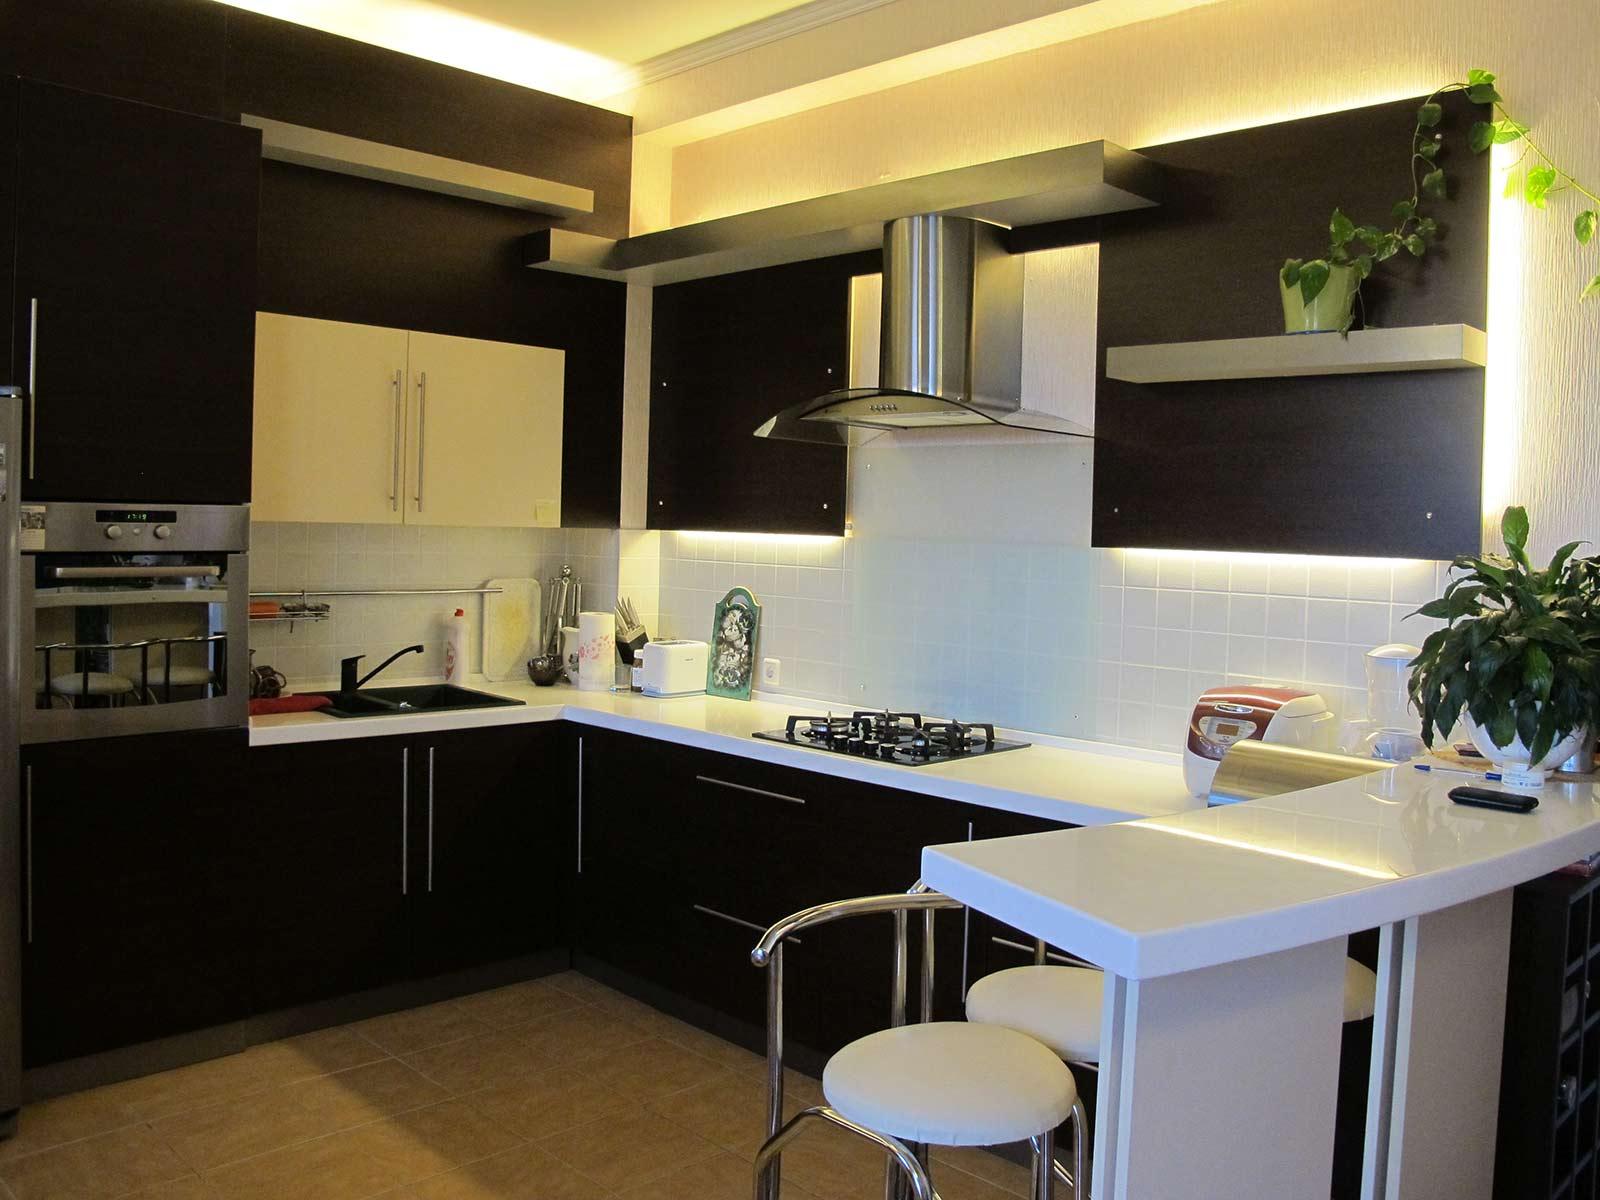 3-х комнатная квартира в «Золоче» 106кв.м.